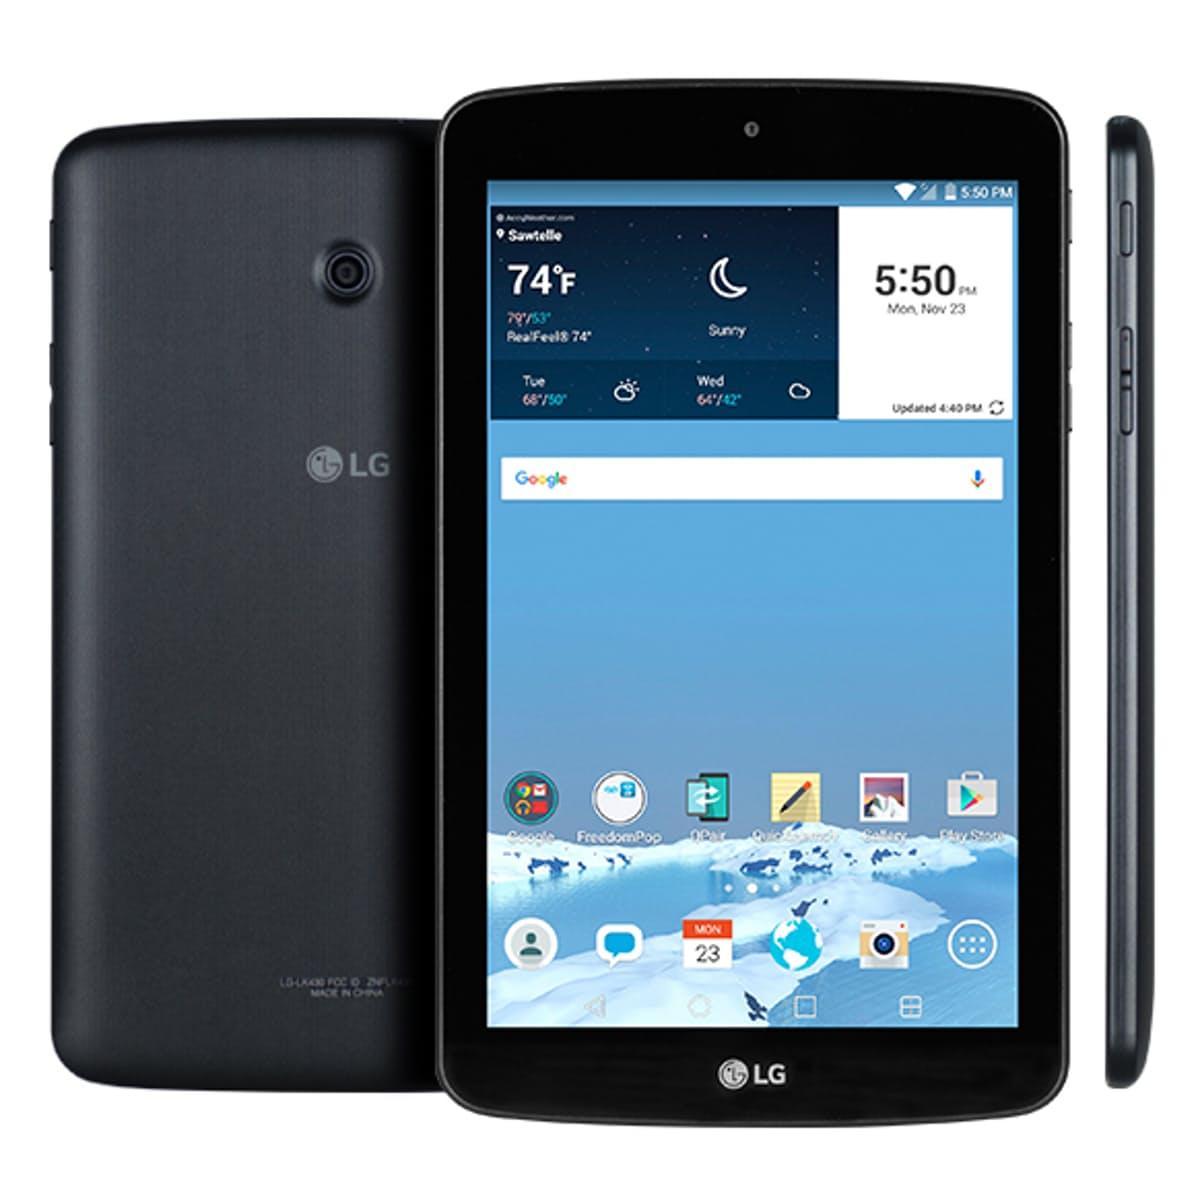 "100% Free Internet w/ 7"" LG G Pad 8GB Tablet WiFi + LTE (Refurb) - FreedomPop $50, Free Shipping"